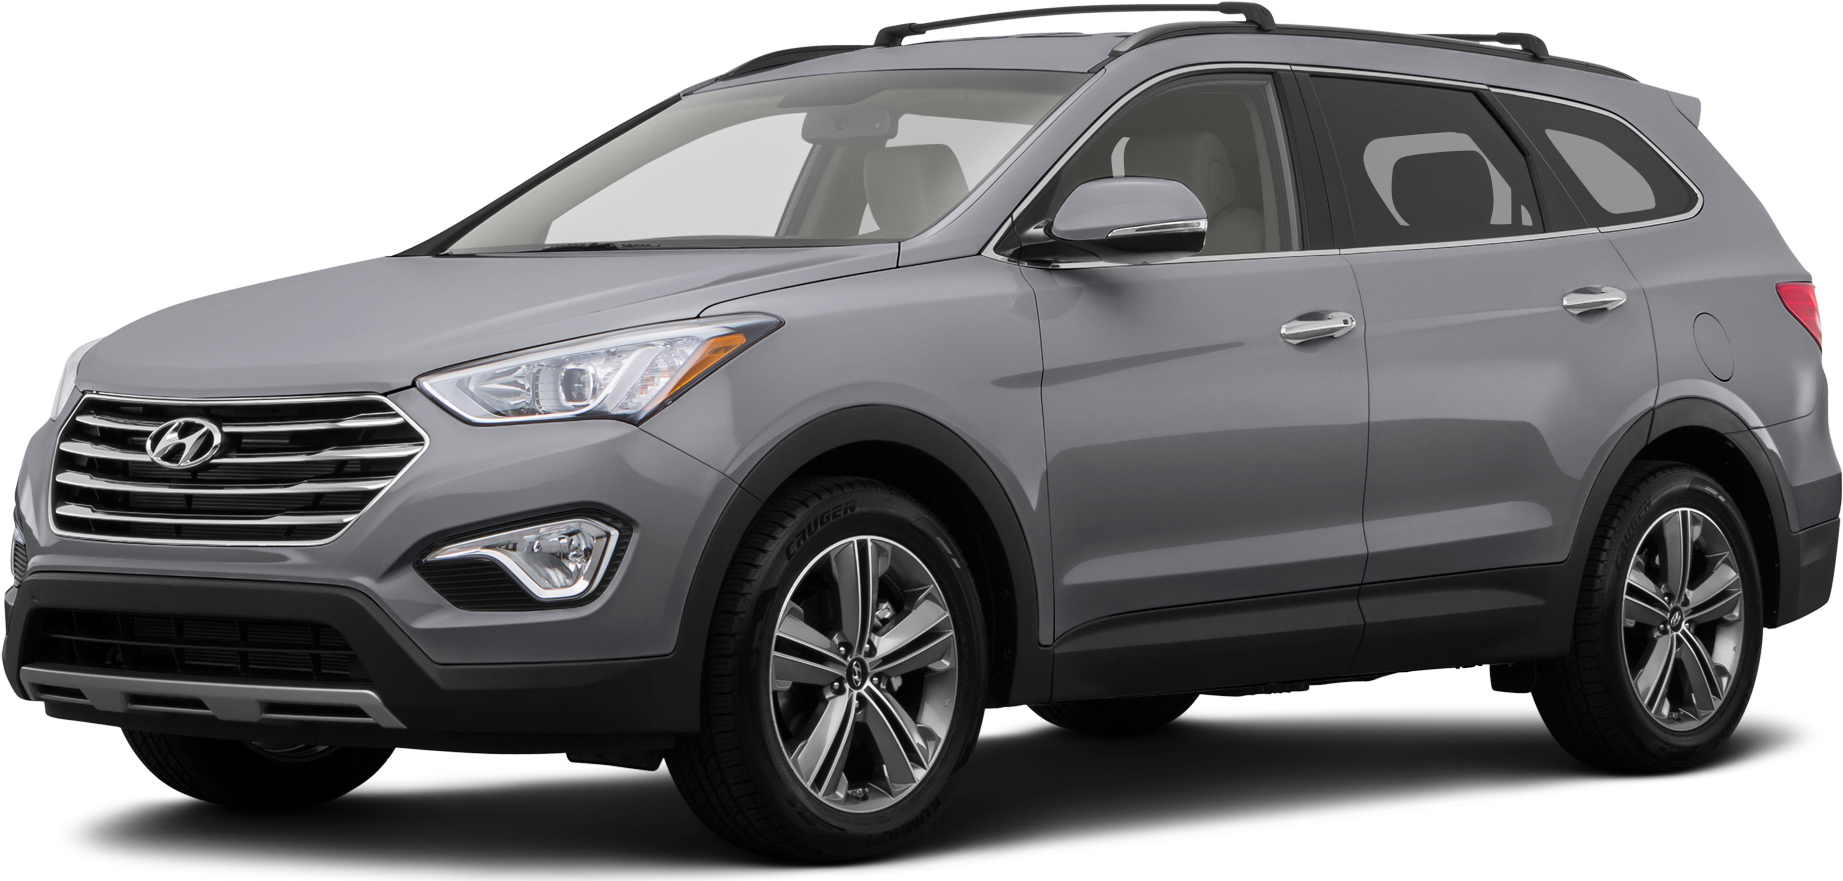 2015 Hyundai Santa Fe Values Cars For Sale Kelley Blue Book